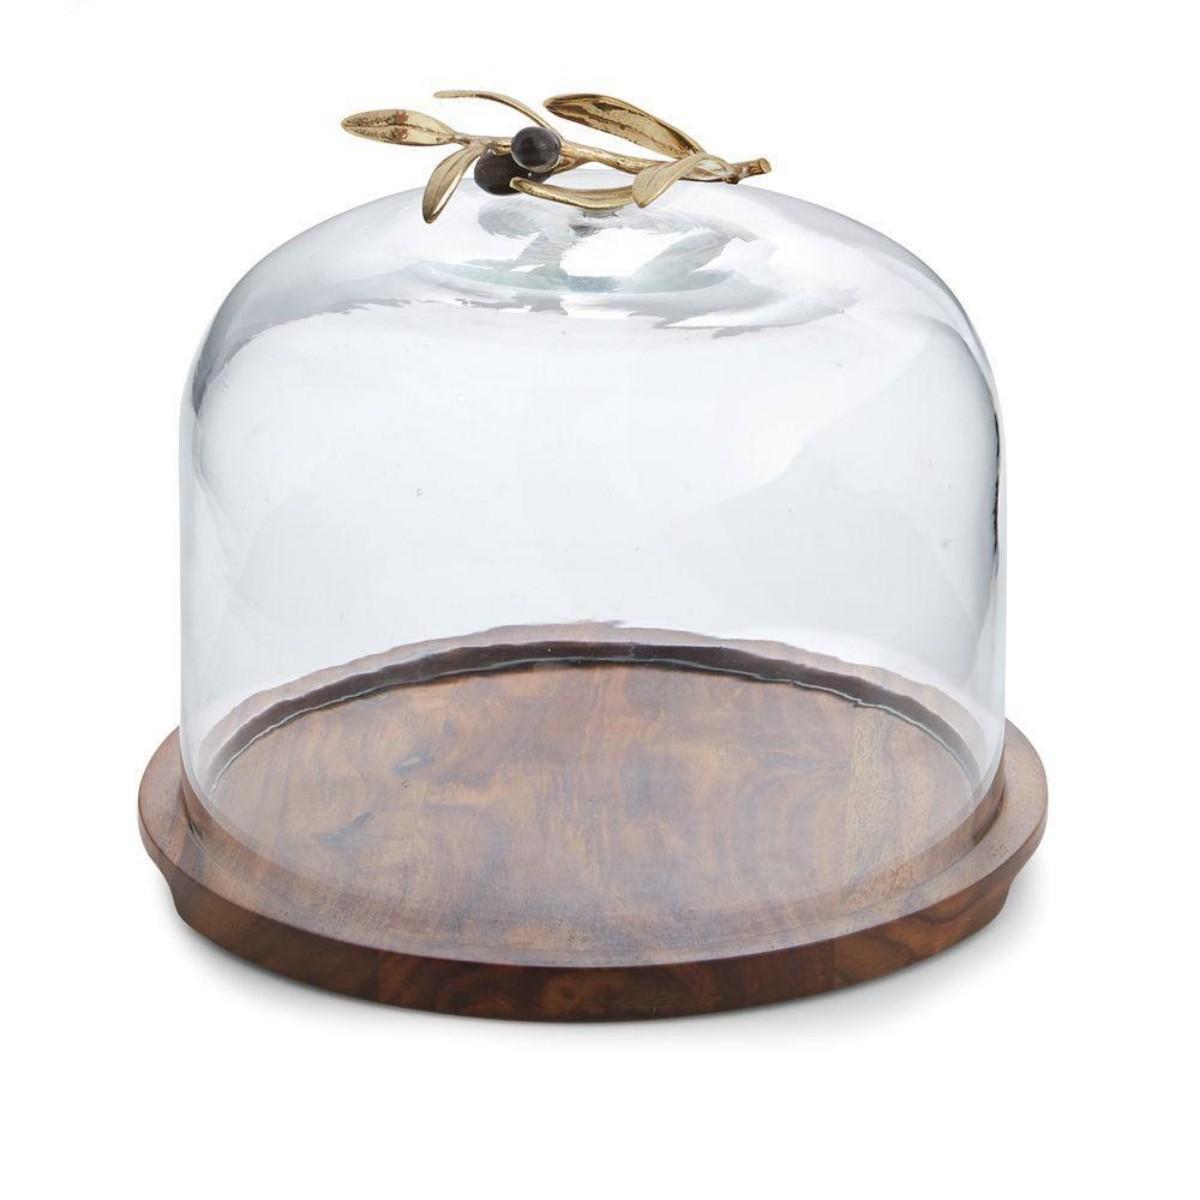 Michael Aram I Olive Branch Glass Dome w/ Wood Base